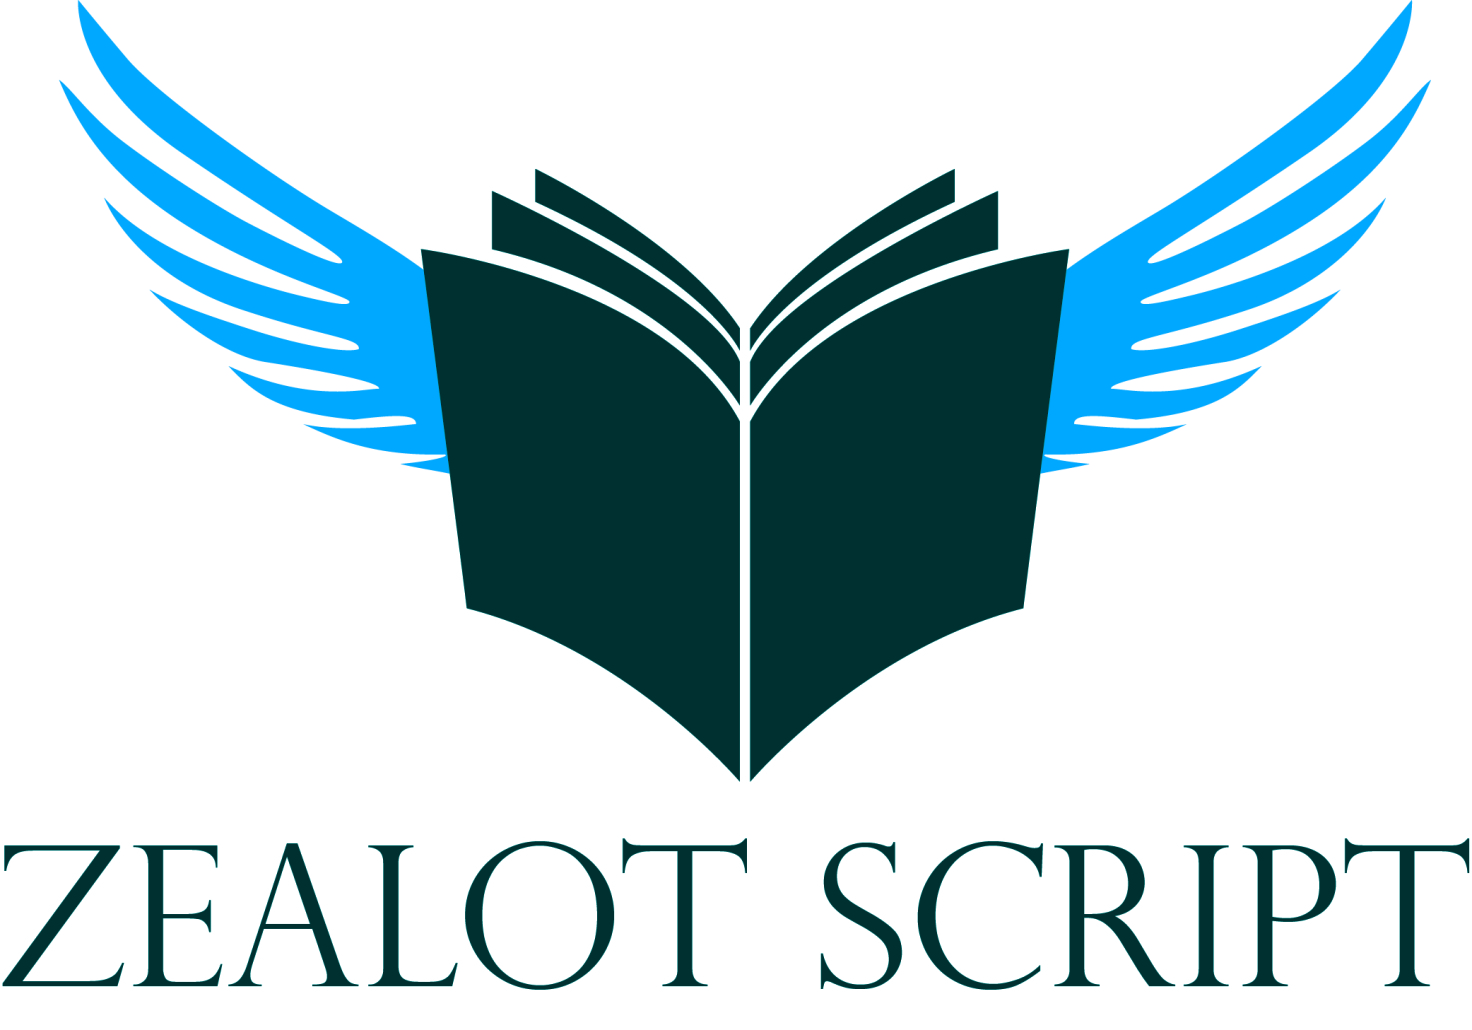 Zealot Script - Emerging Worlds